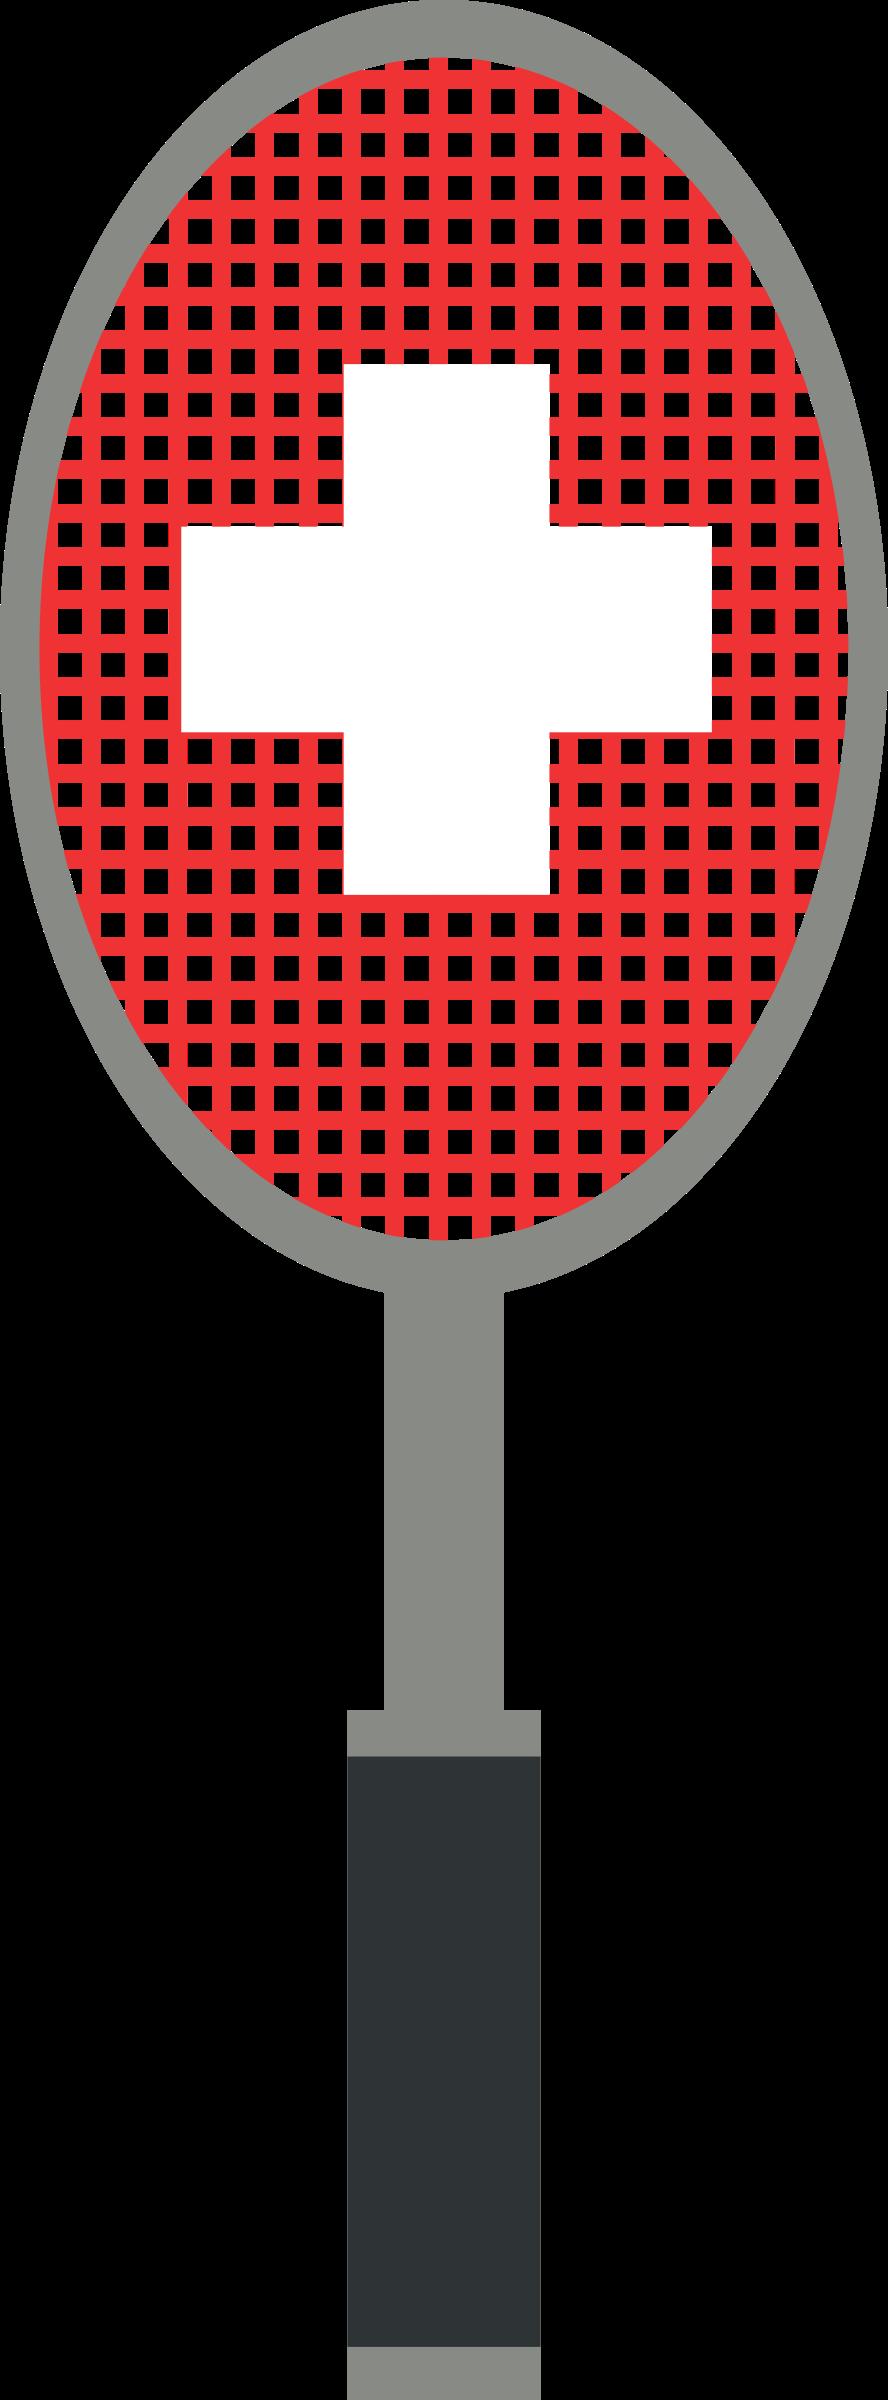 Cup clipart tennis. Davis big image png